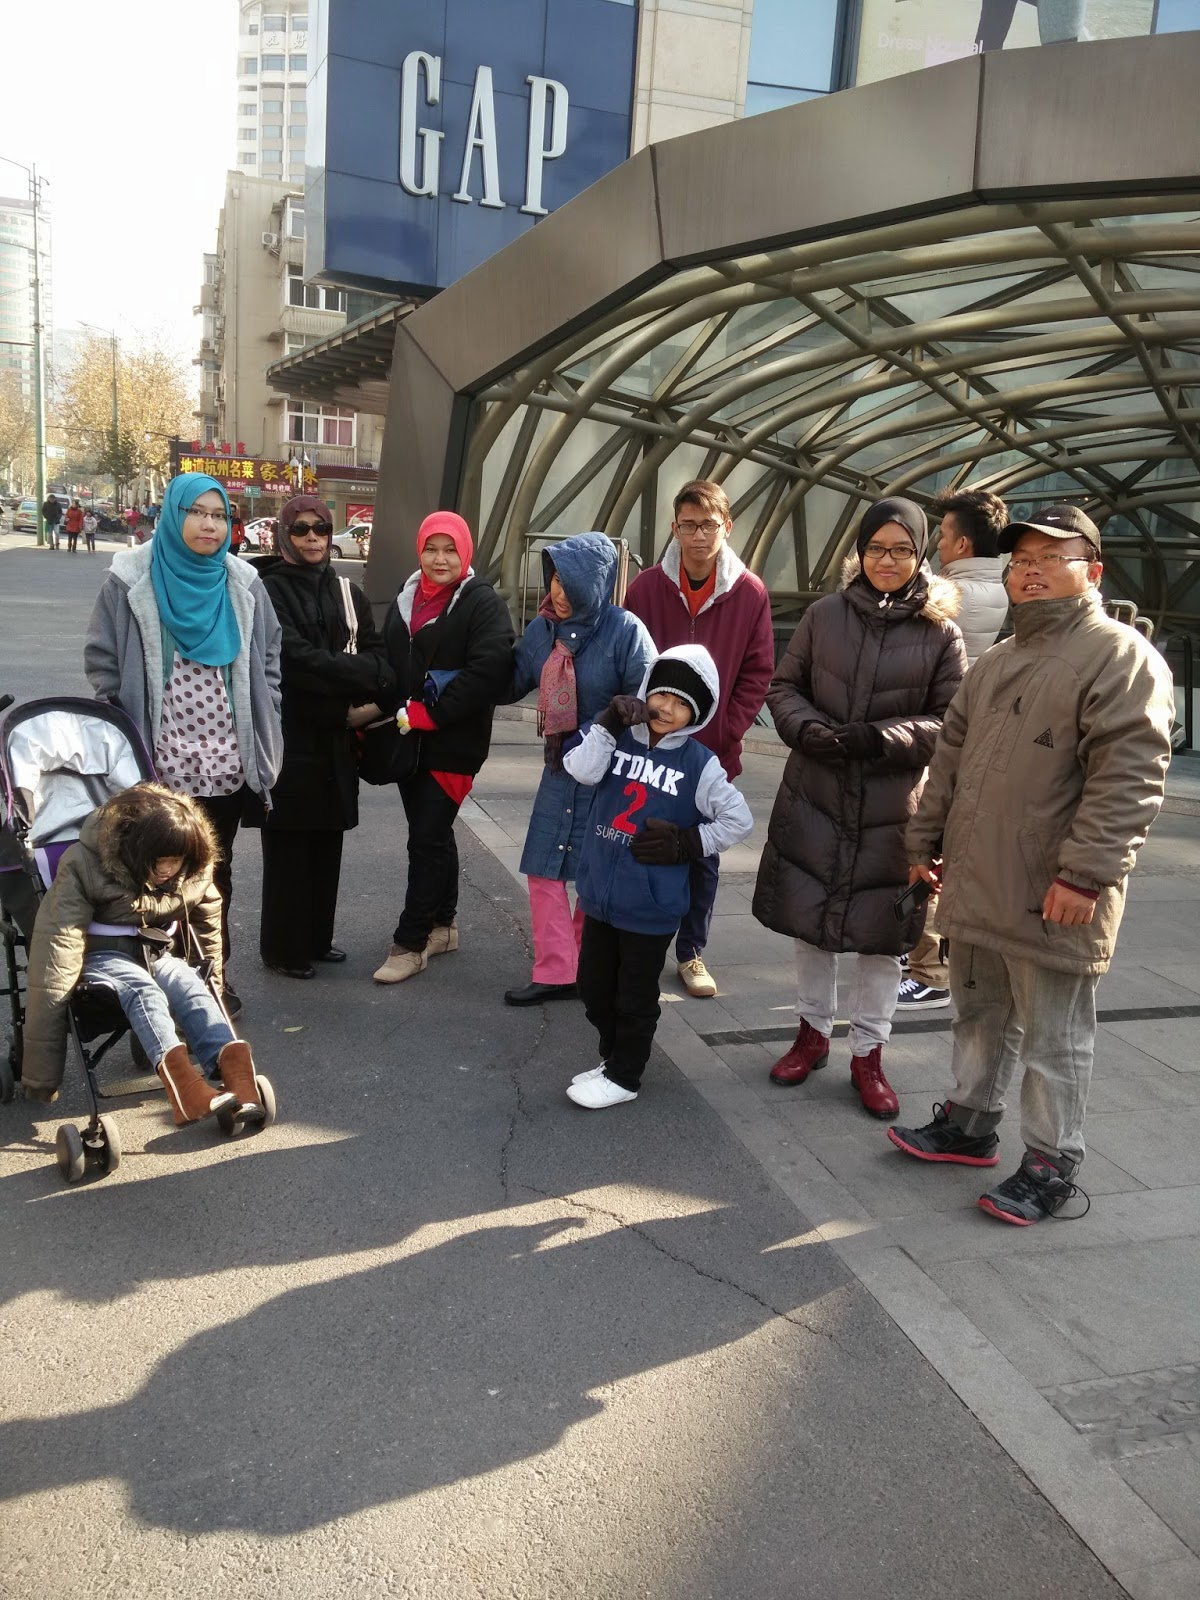 http://aliasmohdyusof.blogspot.com/2014/12/cara-pergi-ke-hangzhou-shanghai-china.html